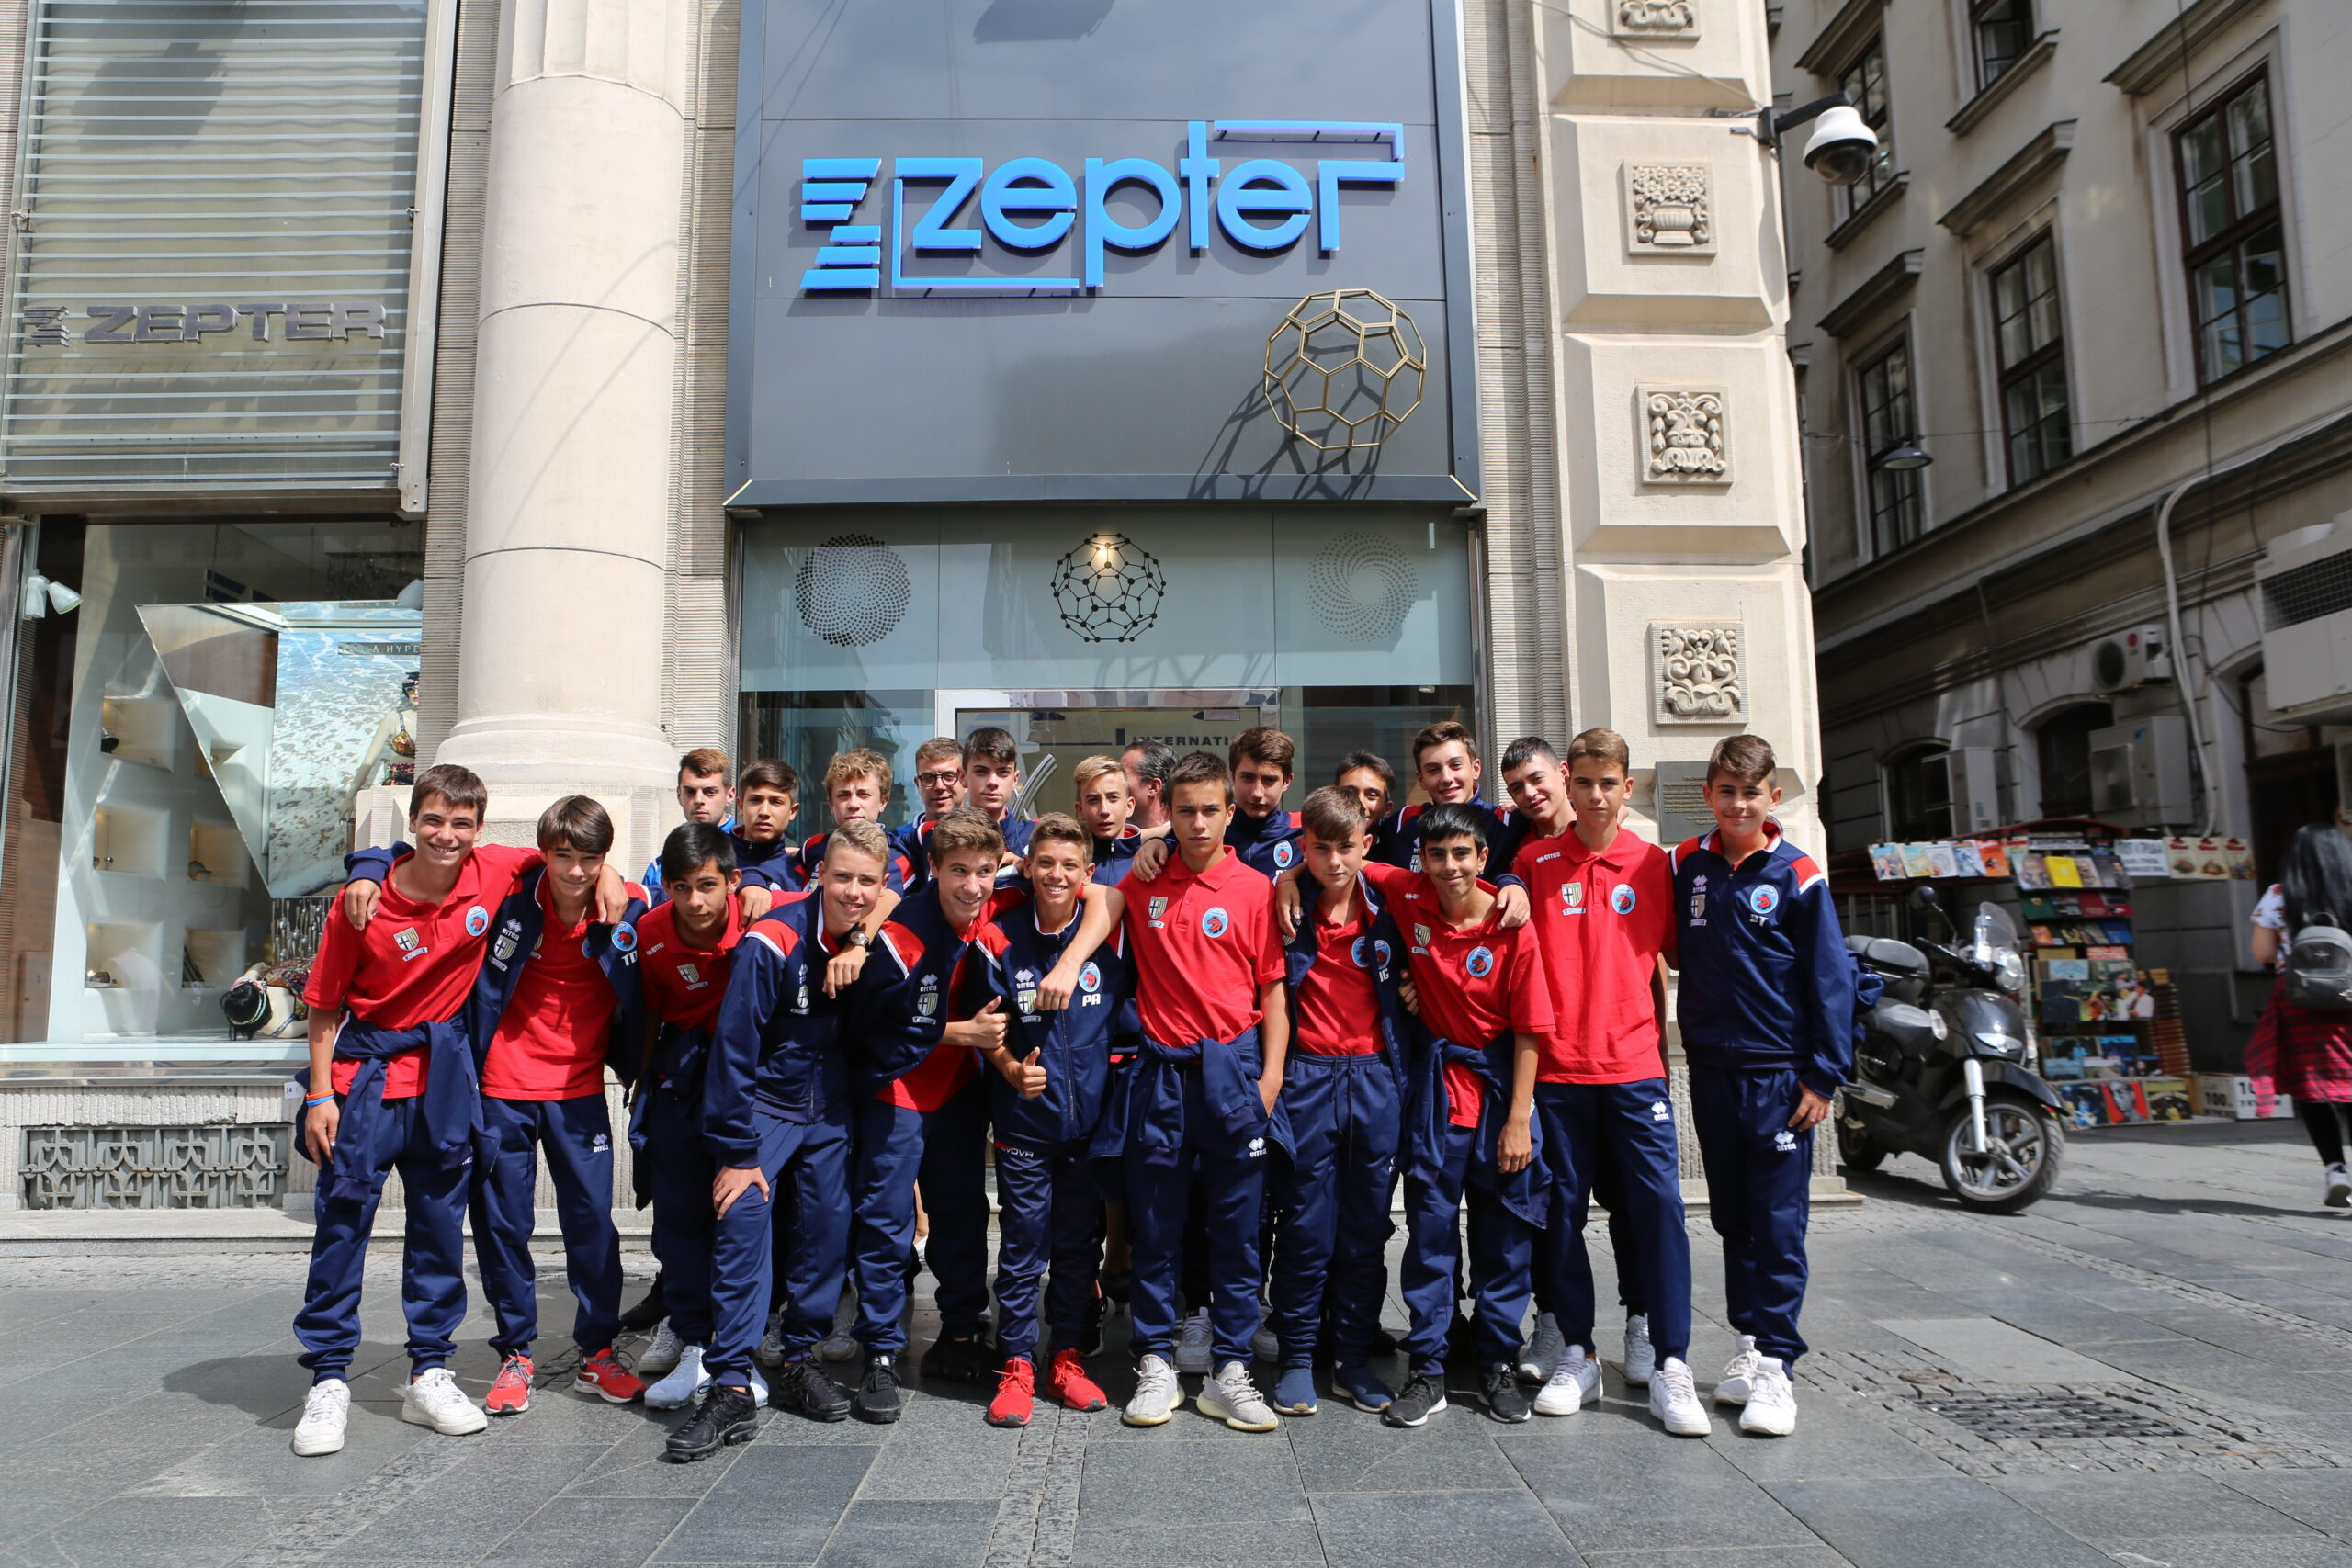 Hotel Zepter in Serbia